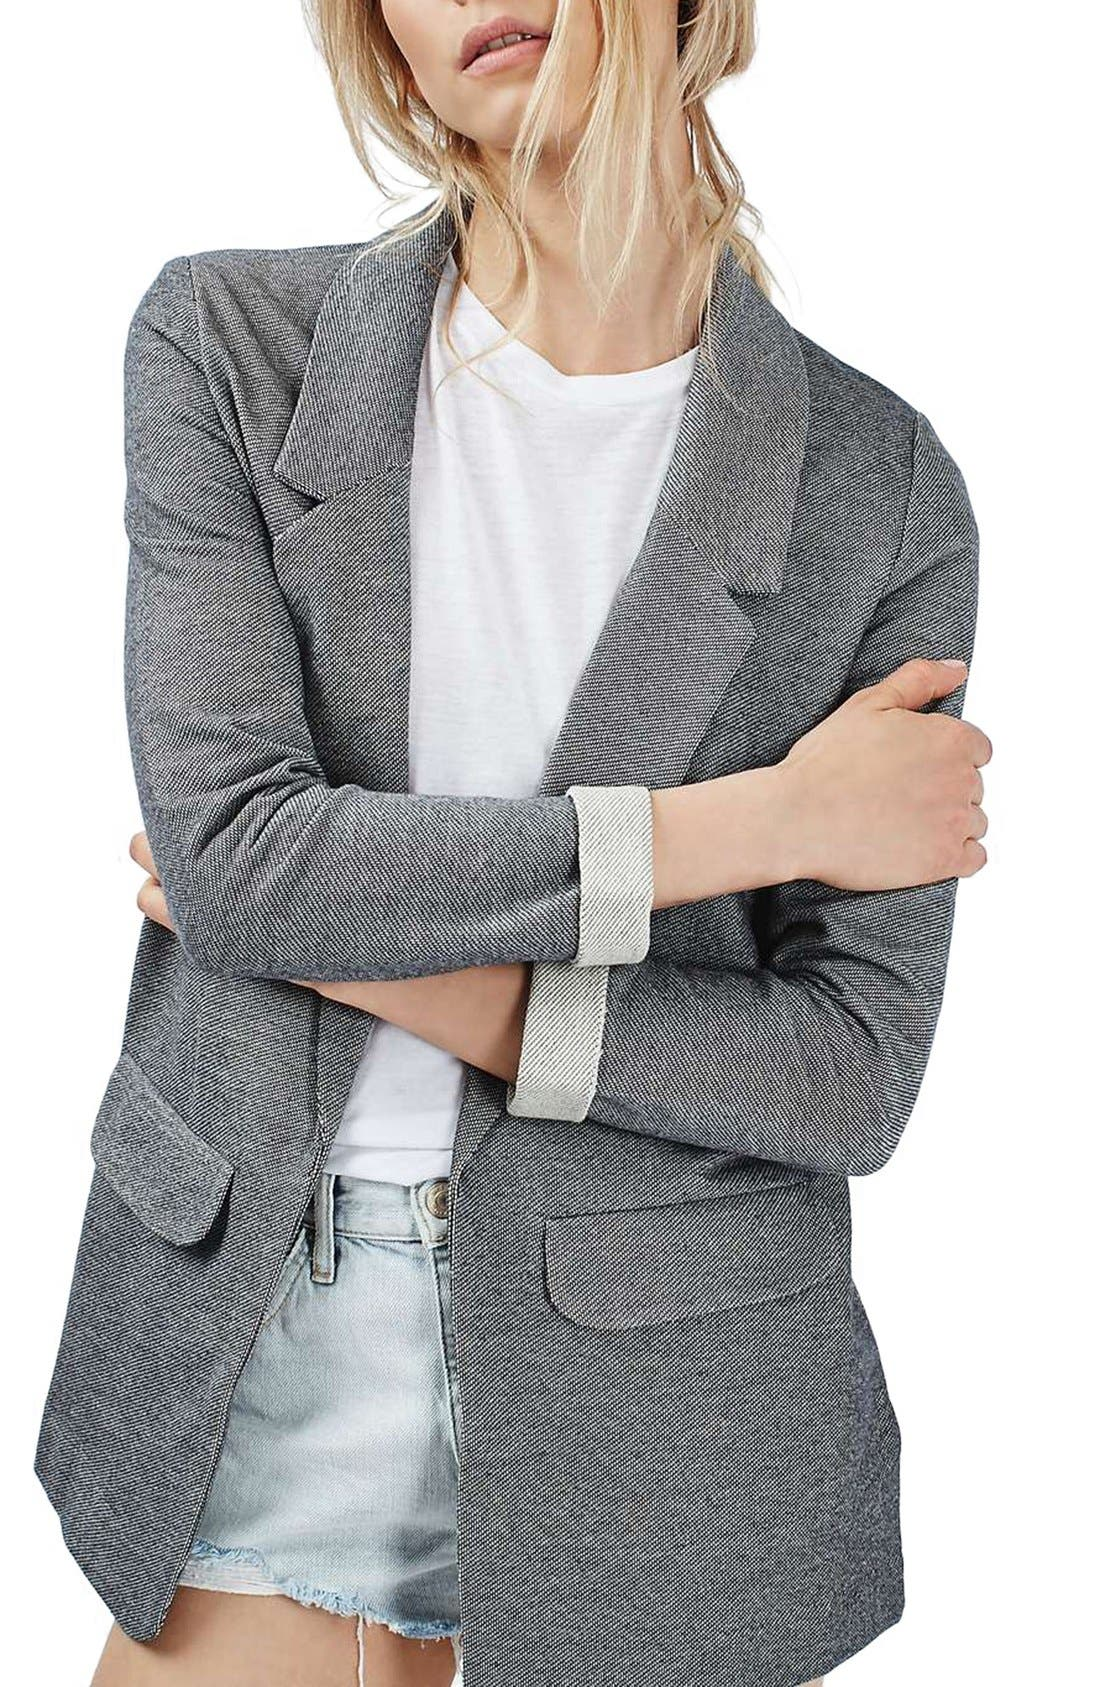 Main Image - Topshop 'Emery Tonic' Oversized Boyfriend Blazer